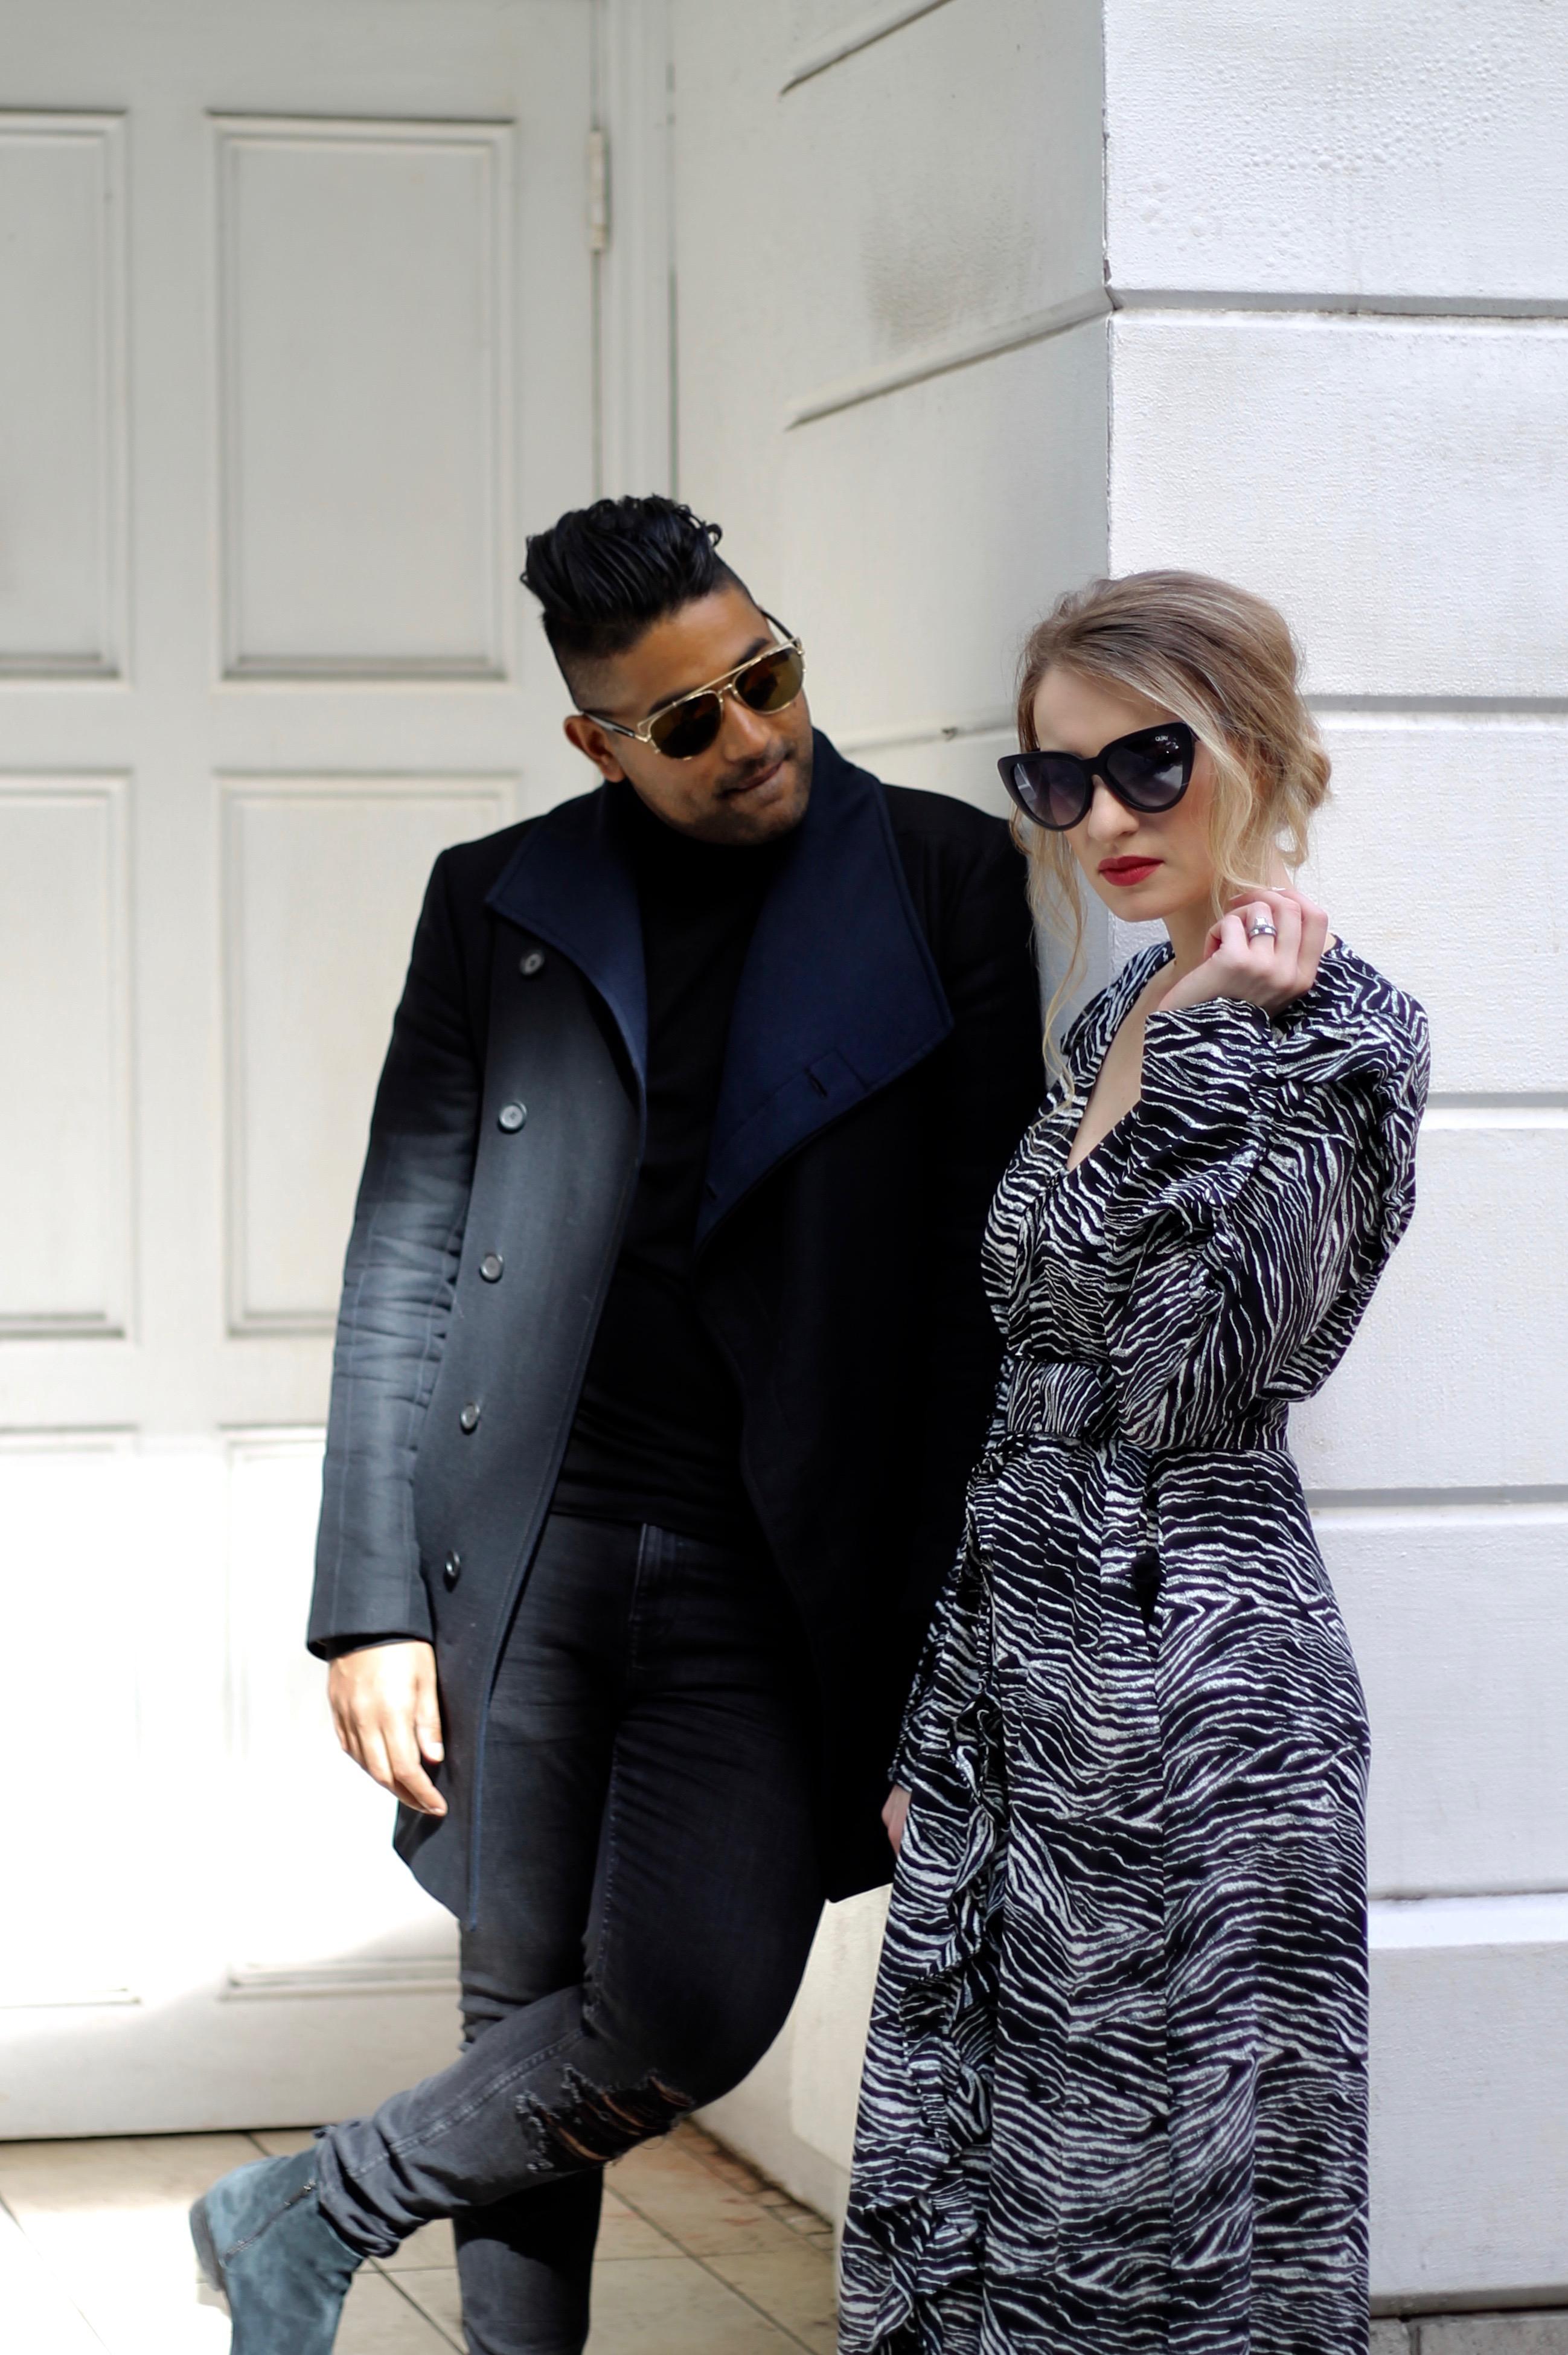 ENDOXIST | MON MODE | Mondoxist Top Ten 2017 | Couple Photos | Toronto Lifestyle Bloggers | 2017